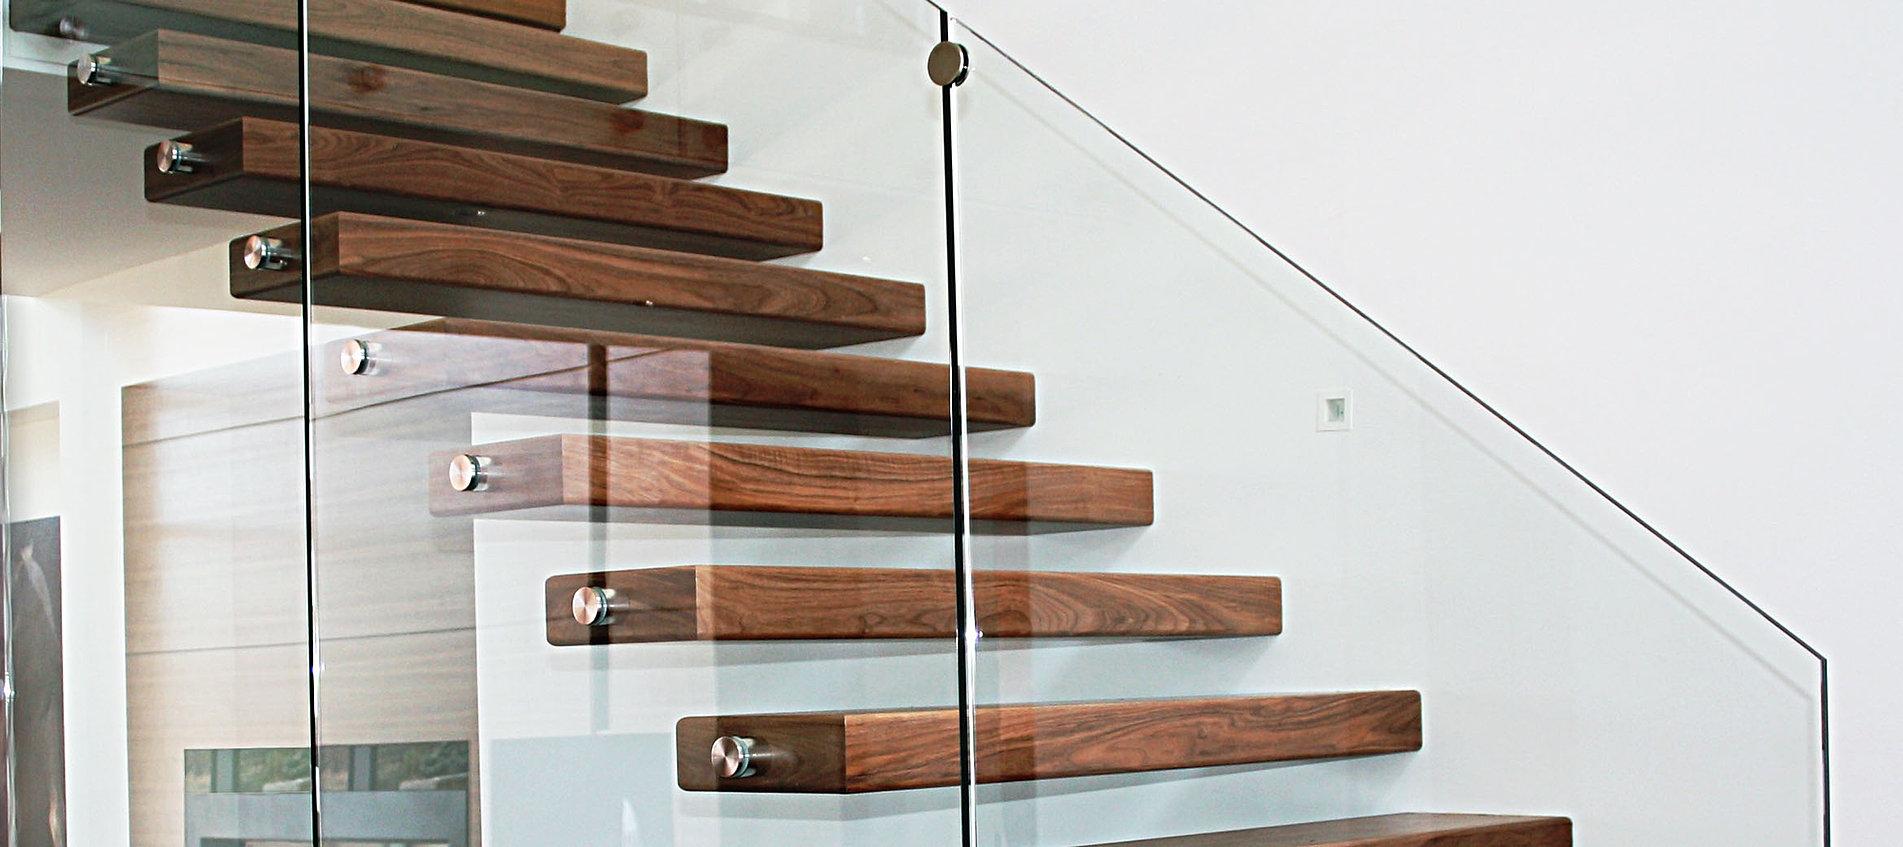 Railings Stairs Home Renovation; Railings Stairs Home Renovation ...